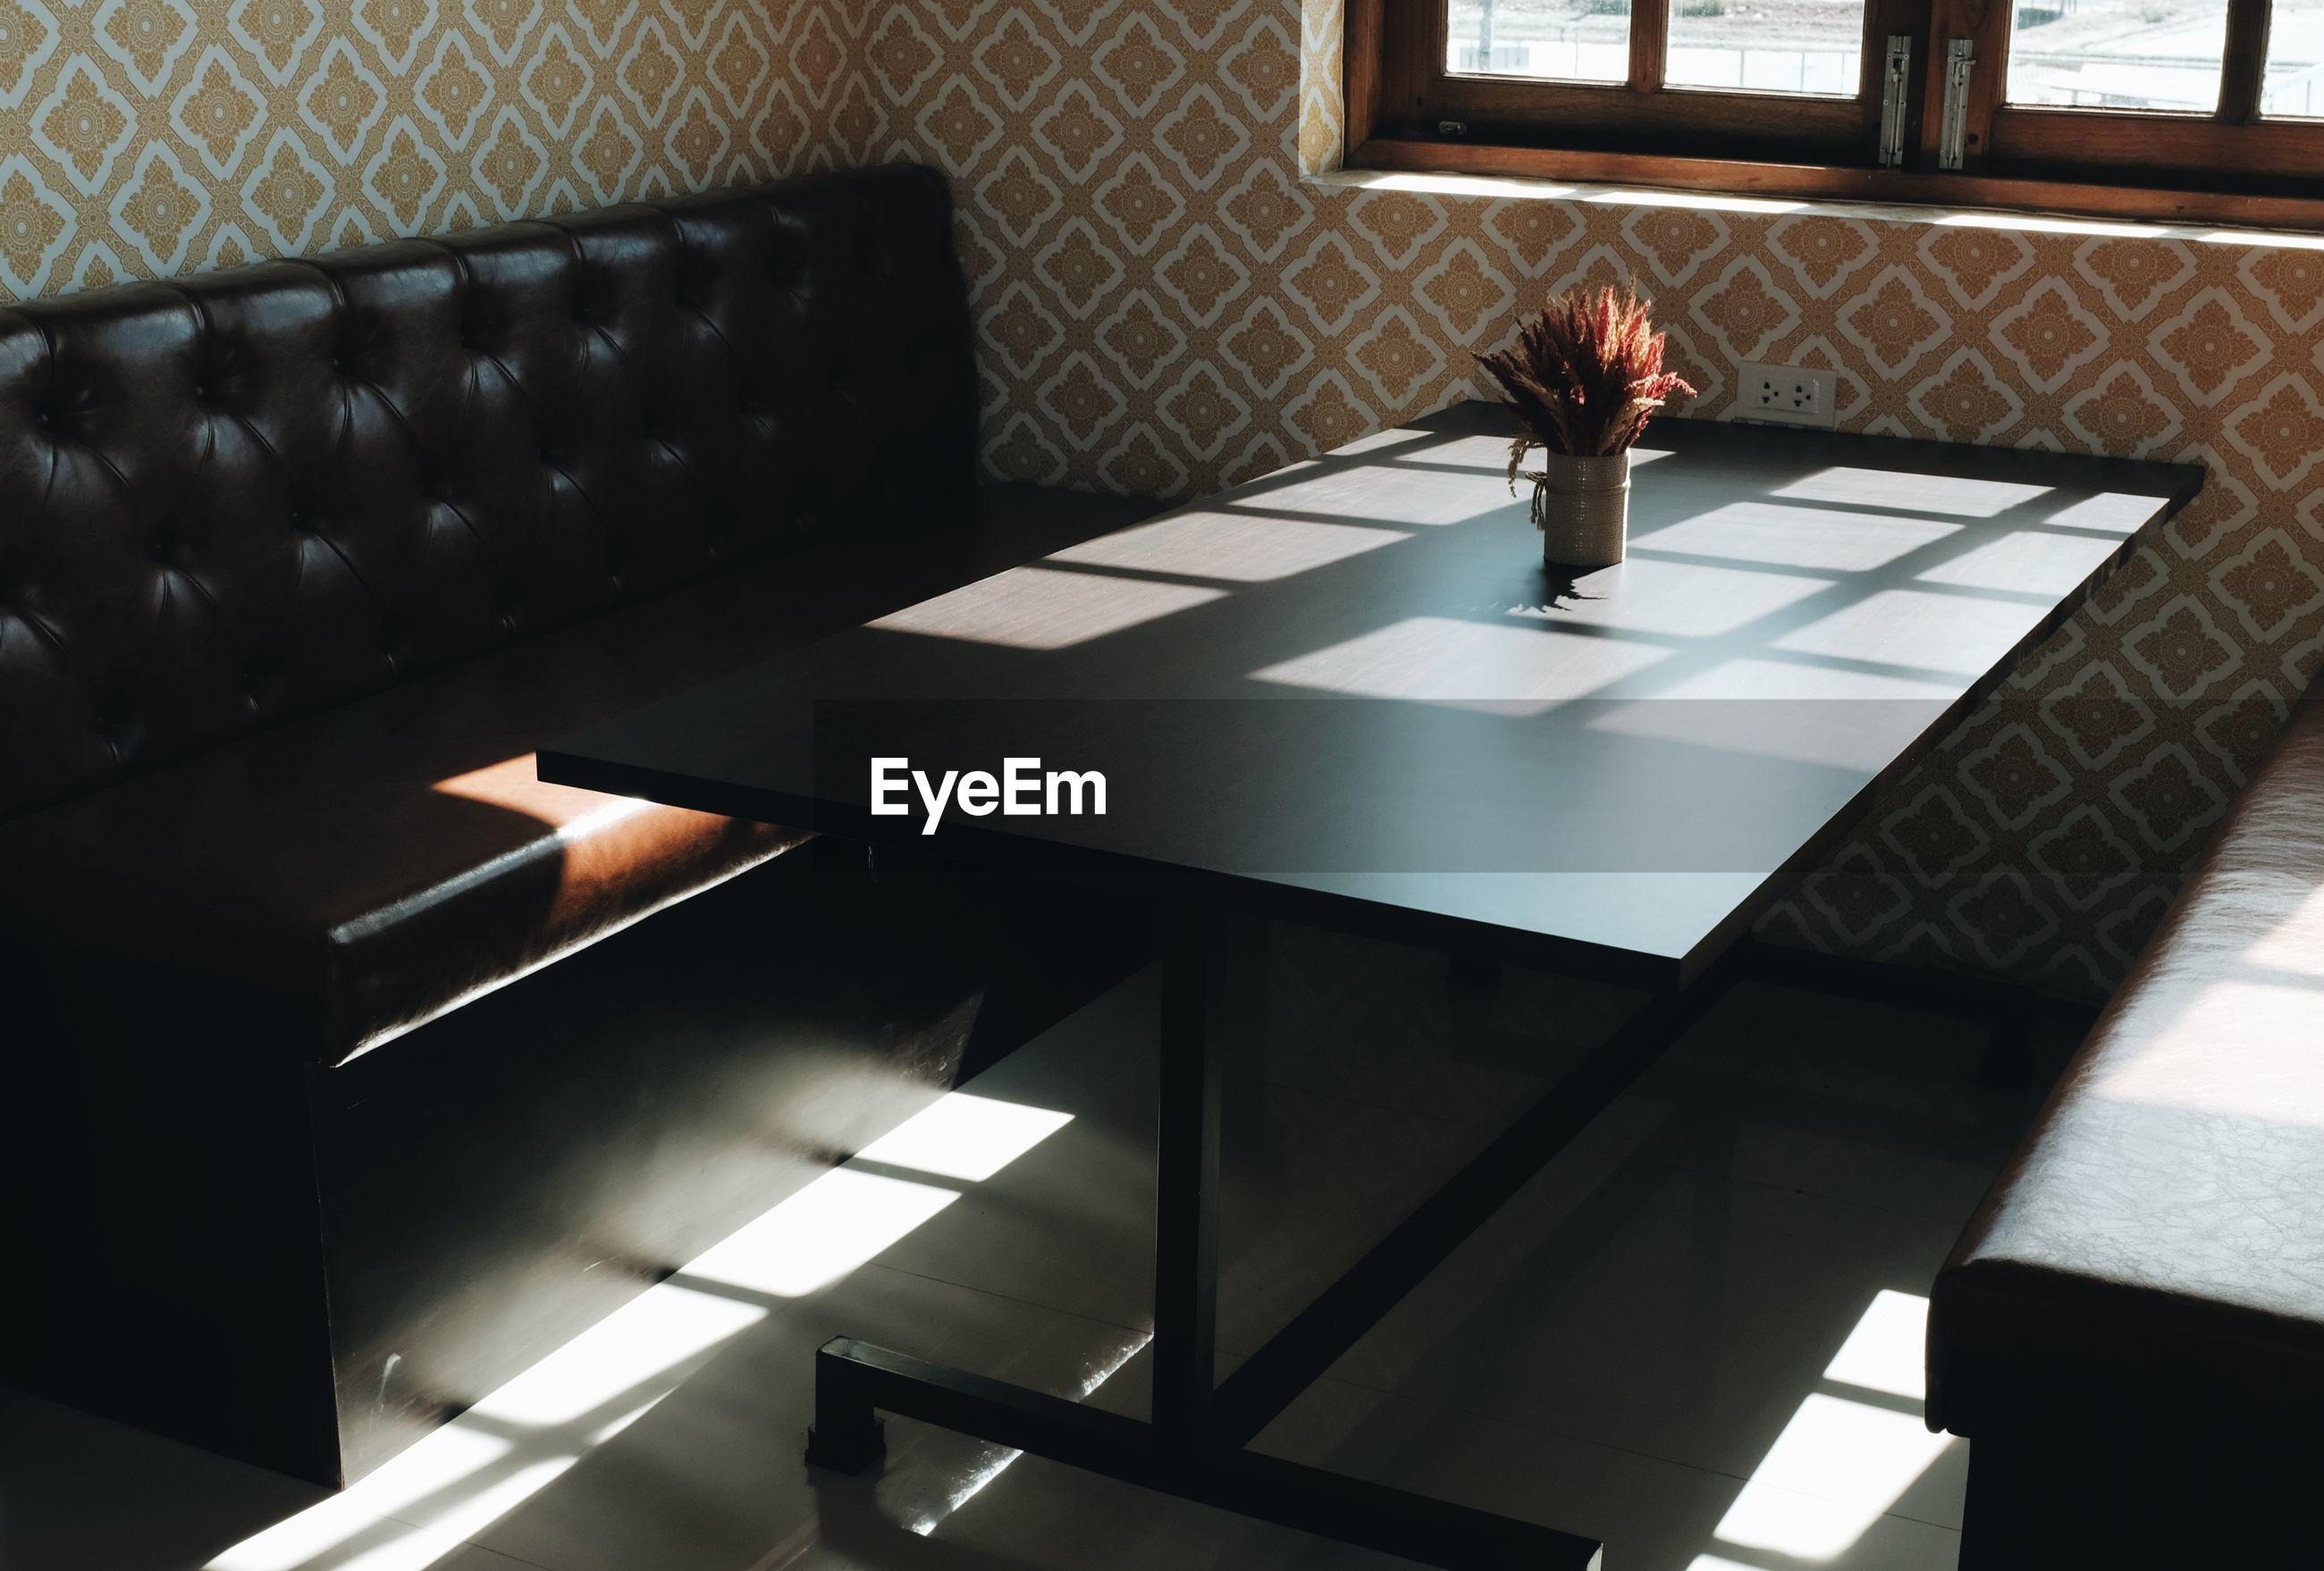 SUNLIGHT FALLING ON TABLE